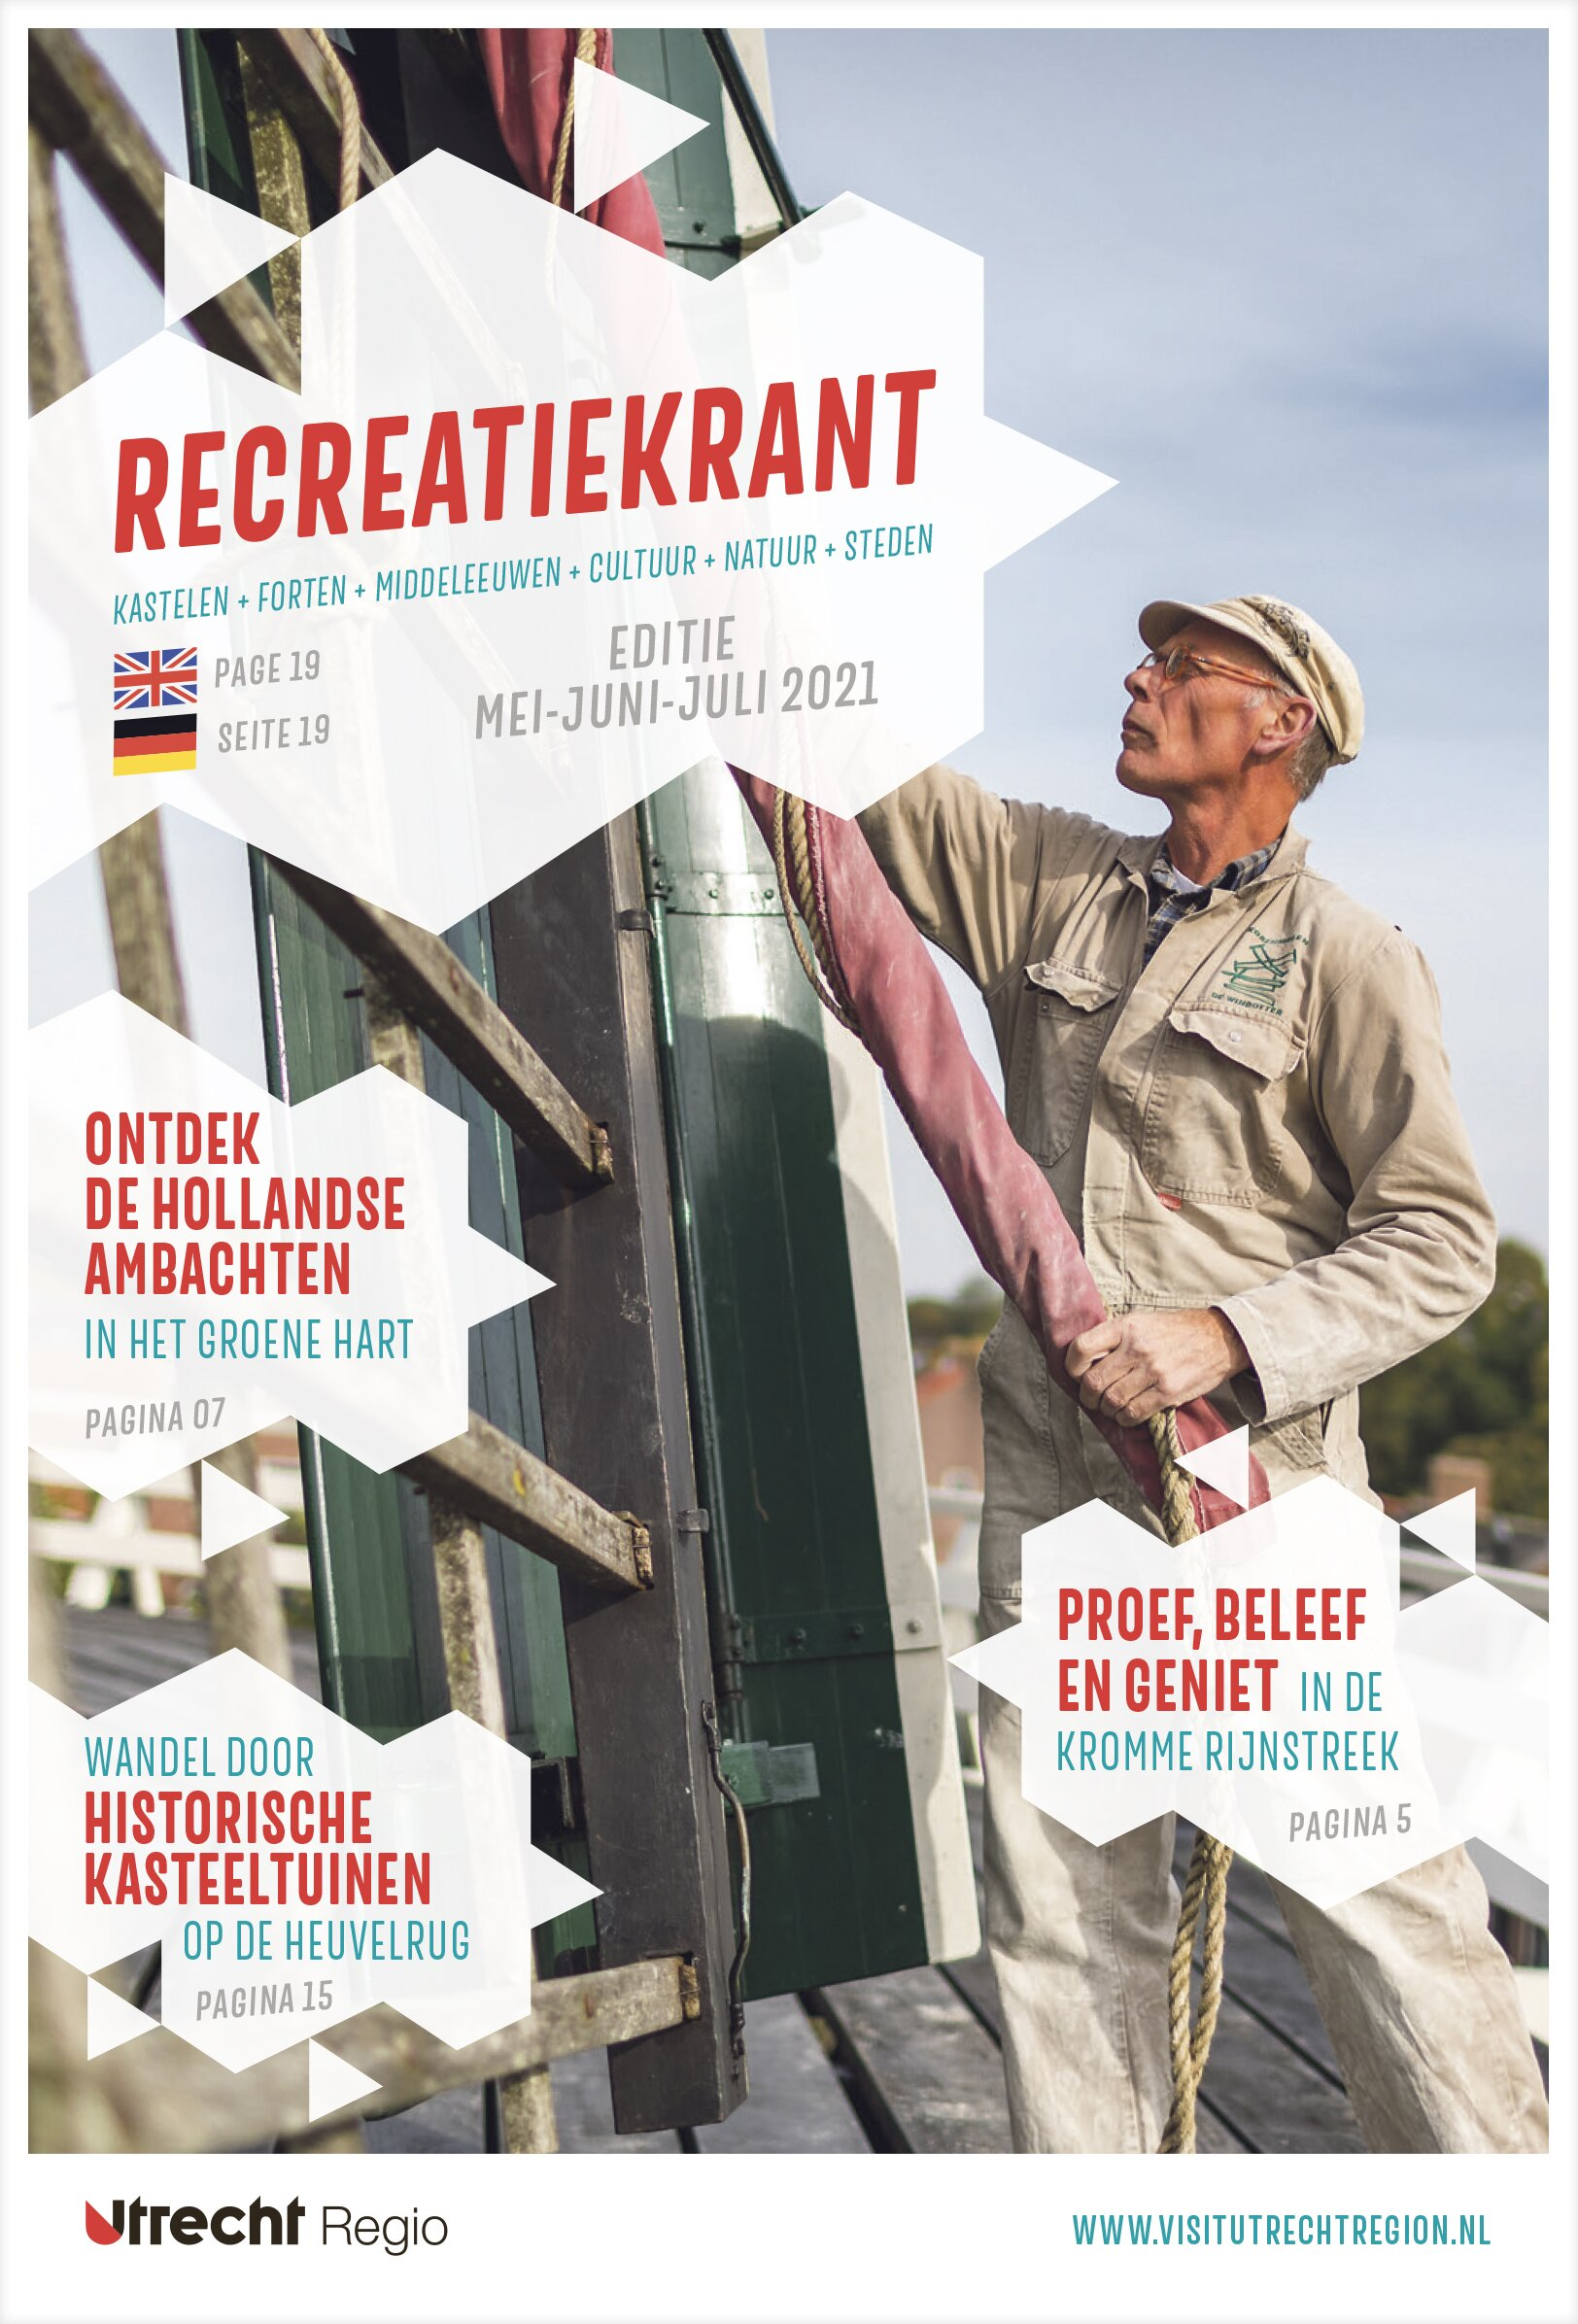 bdu-cover-recreatiekrant-01-2021-jun2021-.jpg